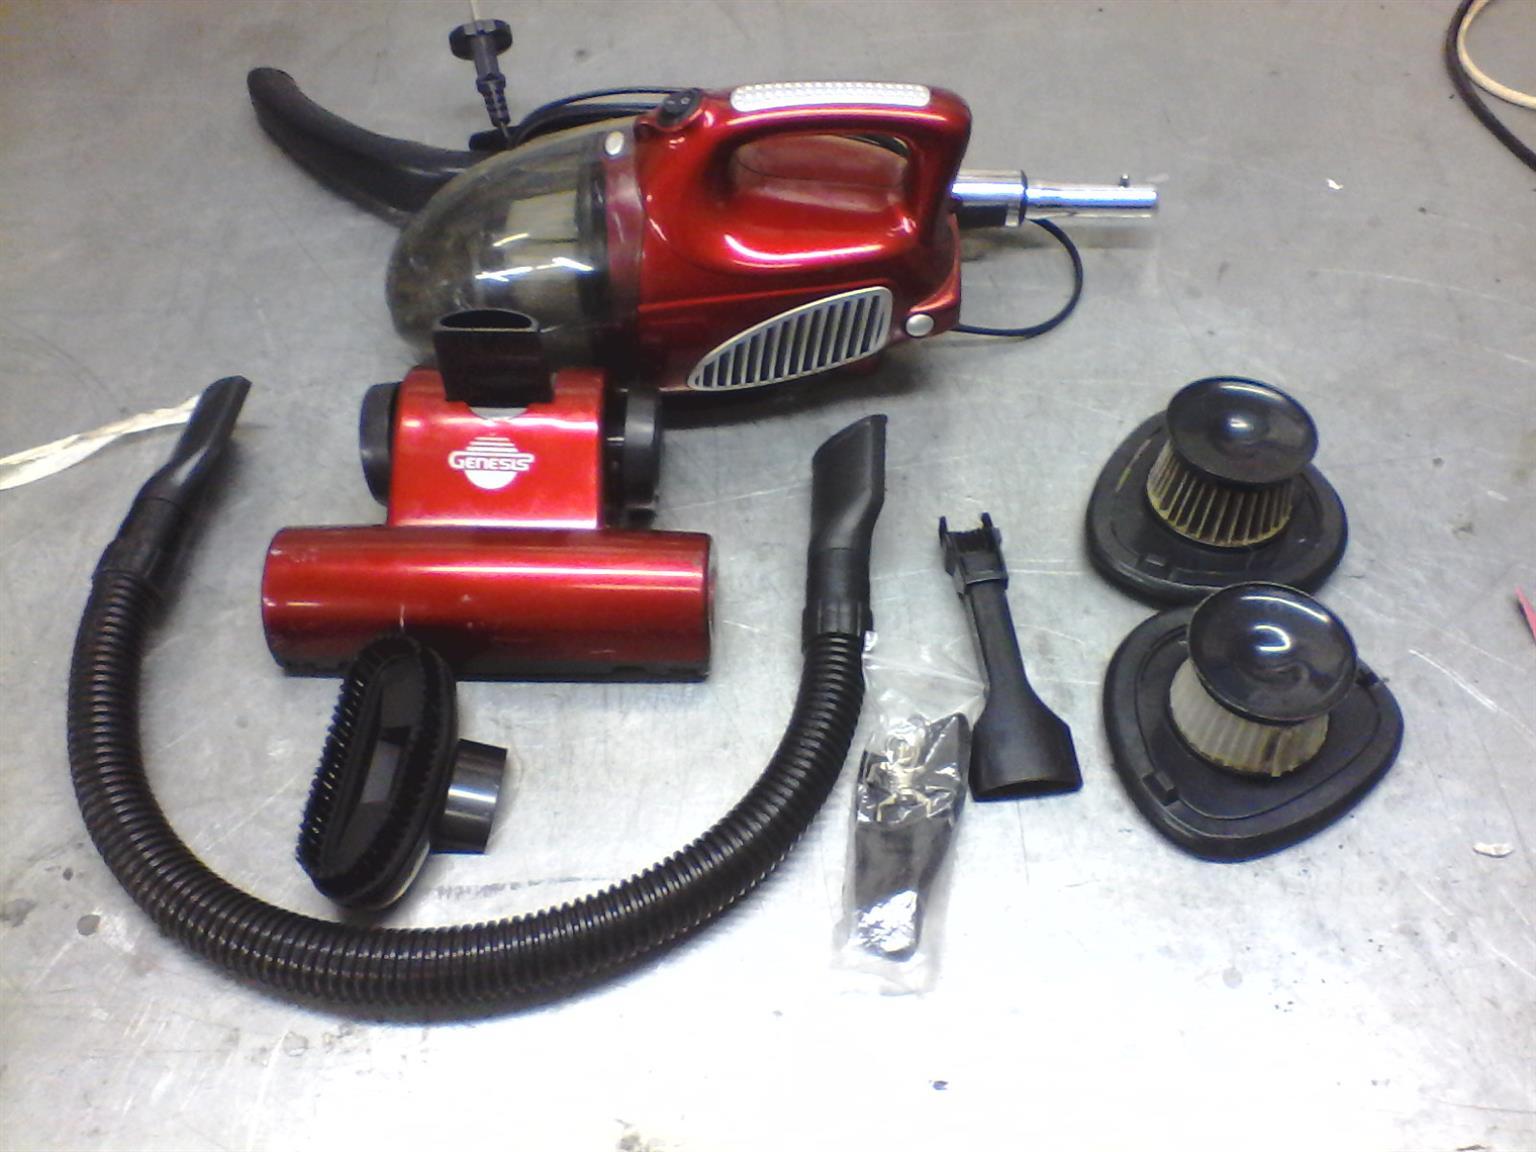 Genesis Minimax 1000w vacuum cleaner like new